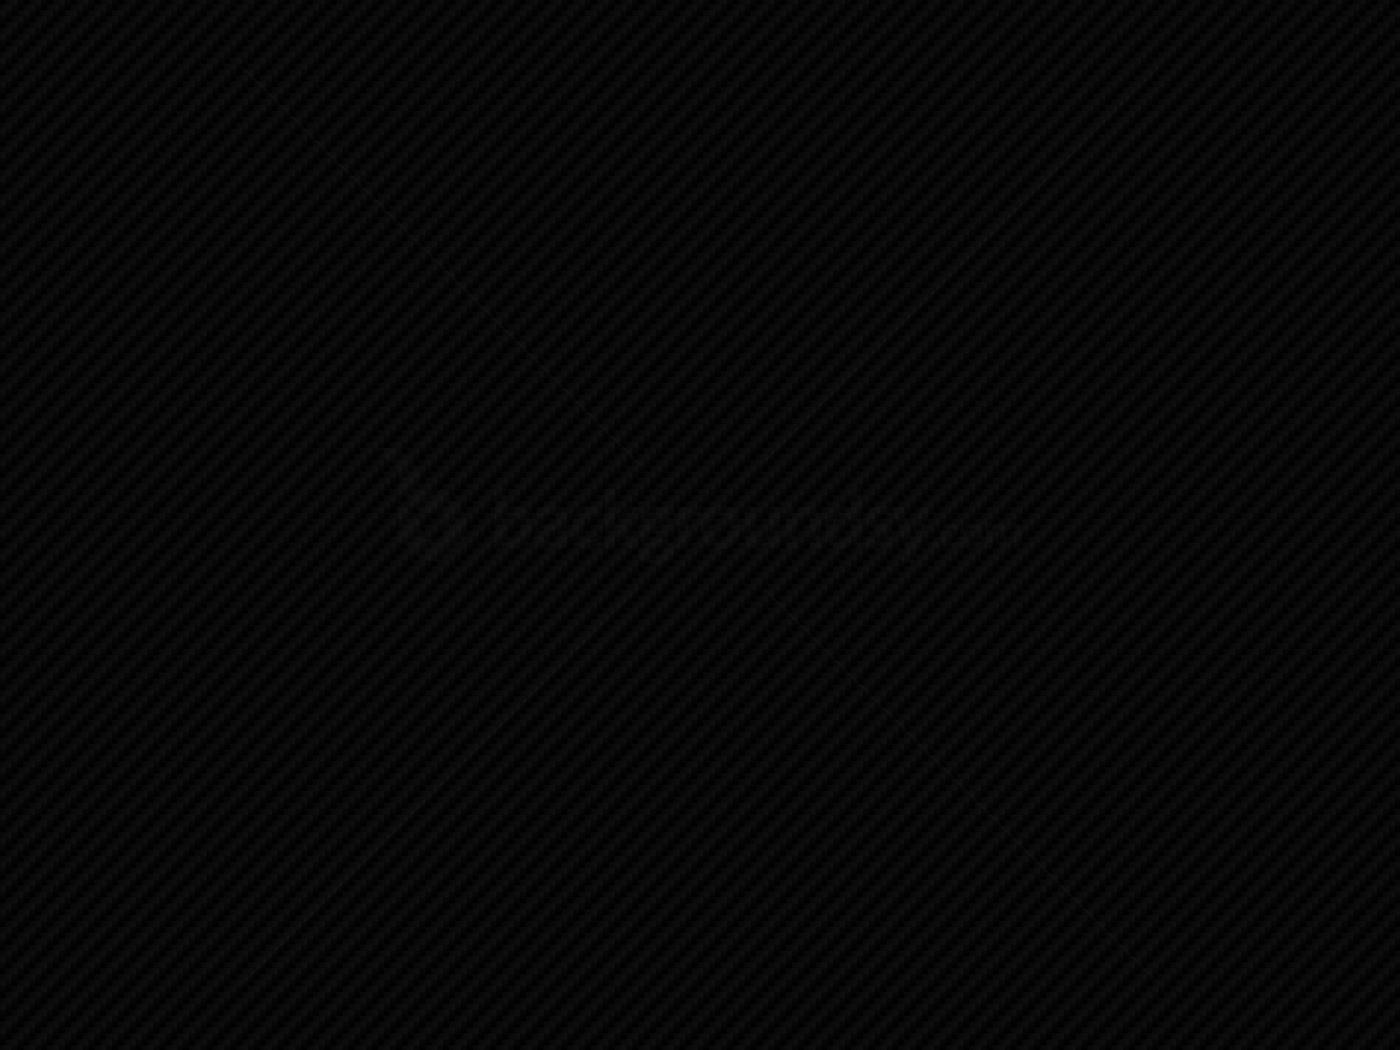 carbon fiber texture backgroundsycom